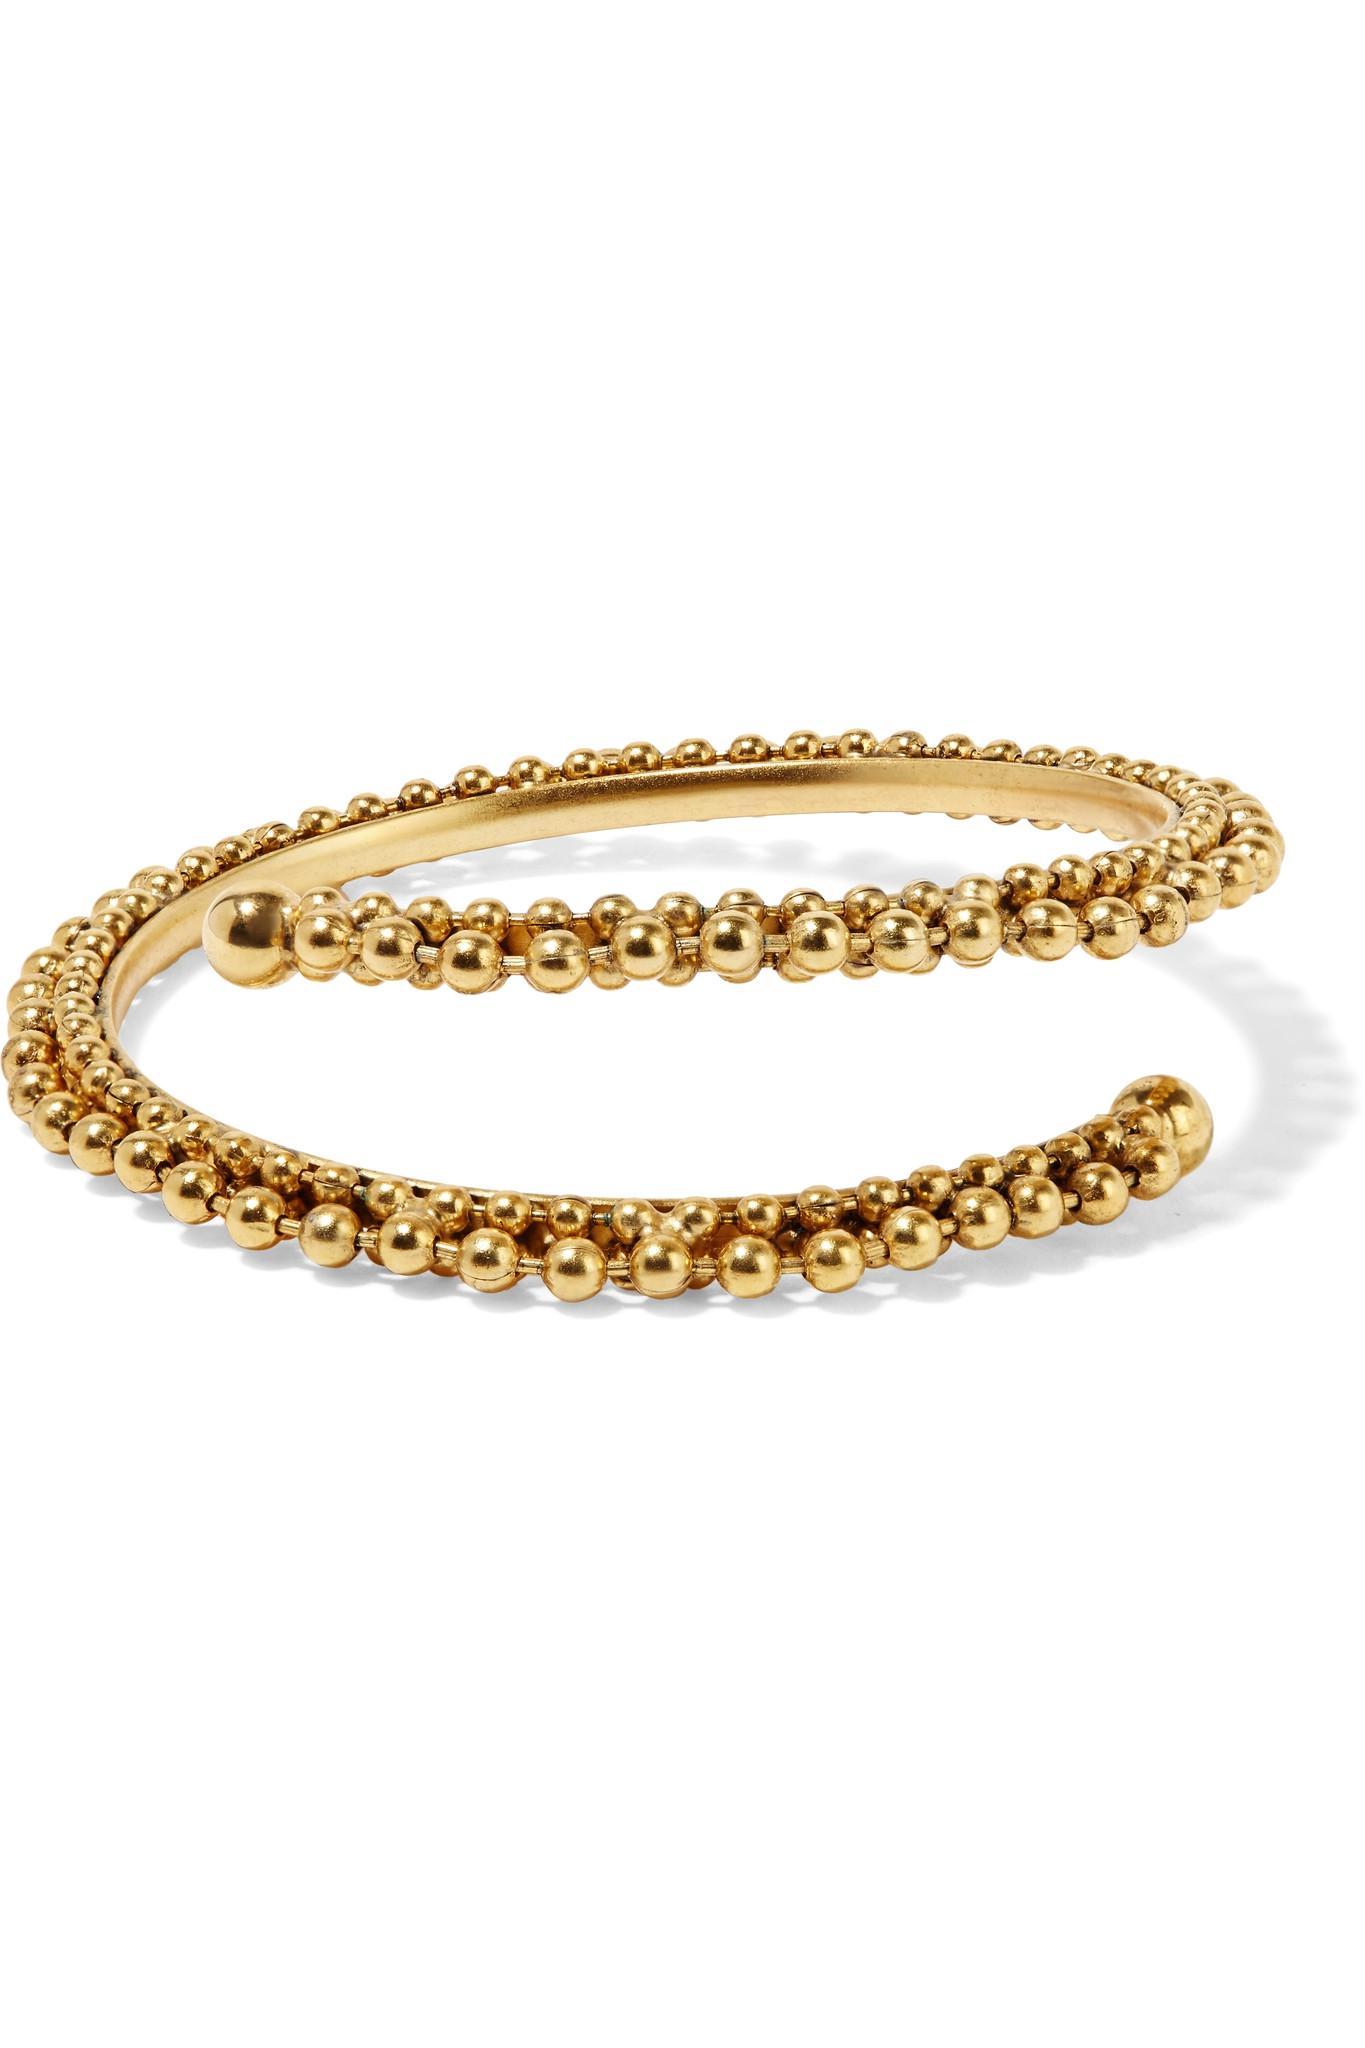 e4741790565 Lyst - Elizabeth Cole Gia Gold-plated Bangle in Metallic